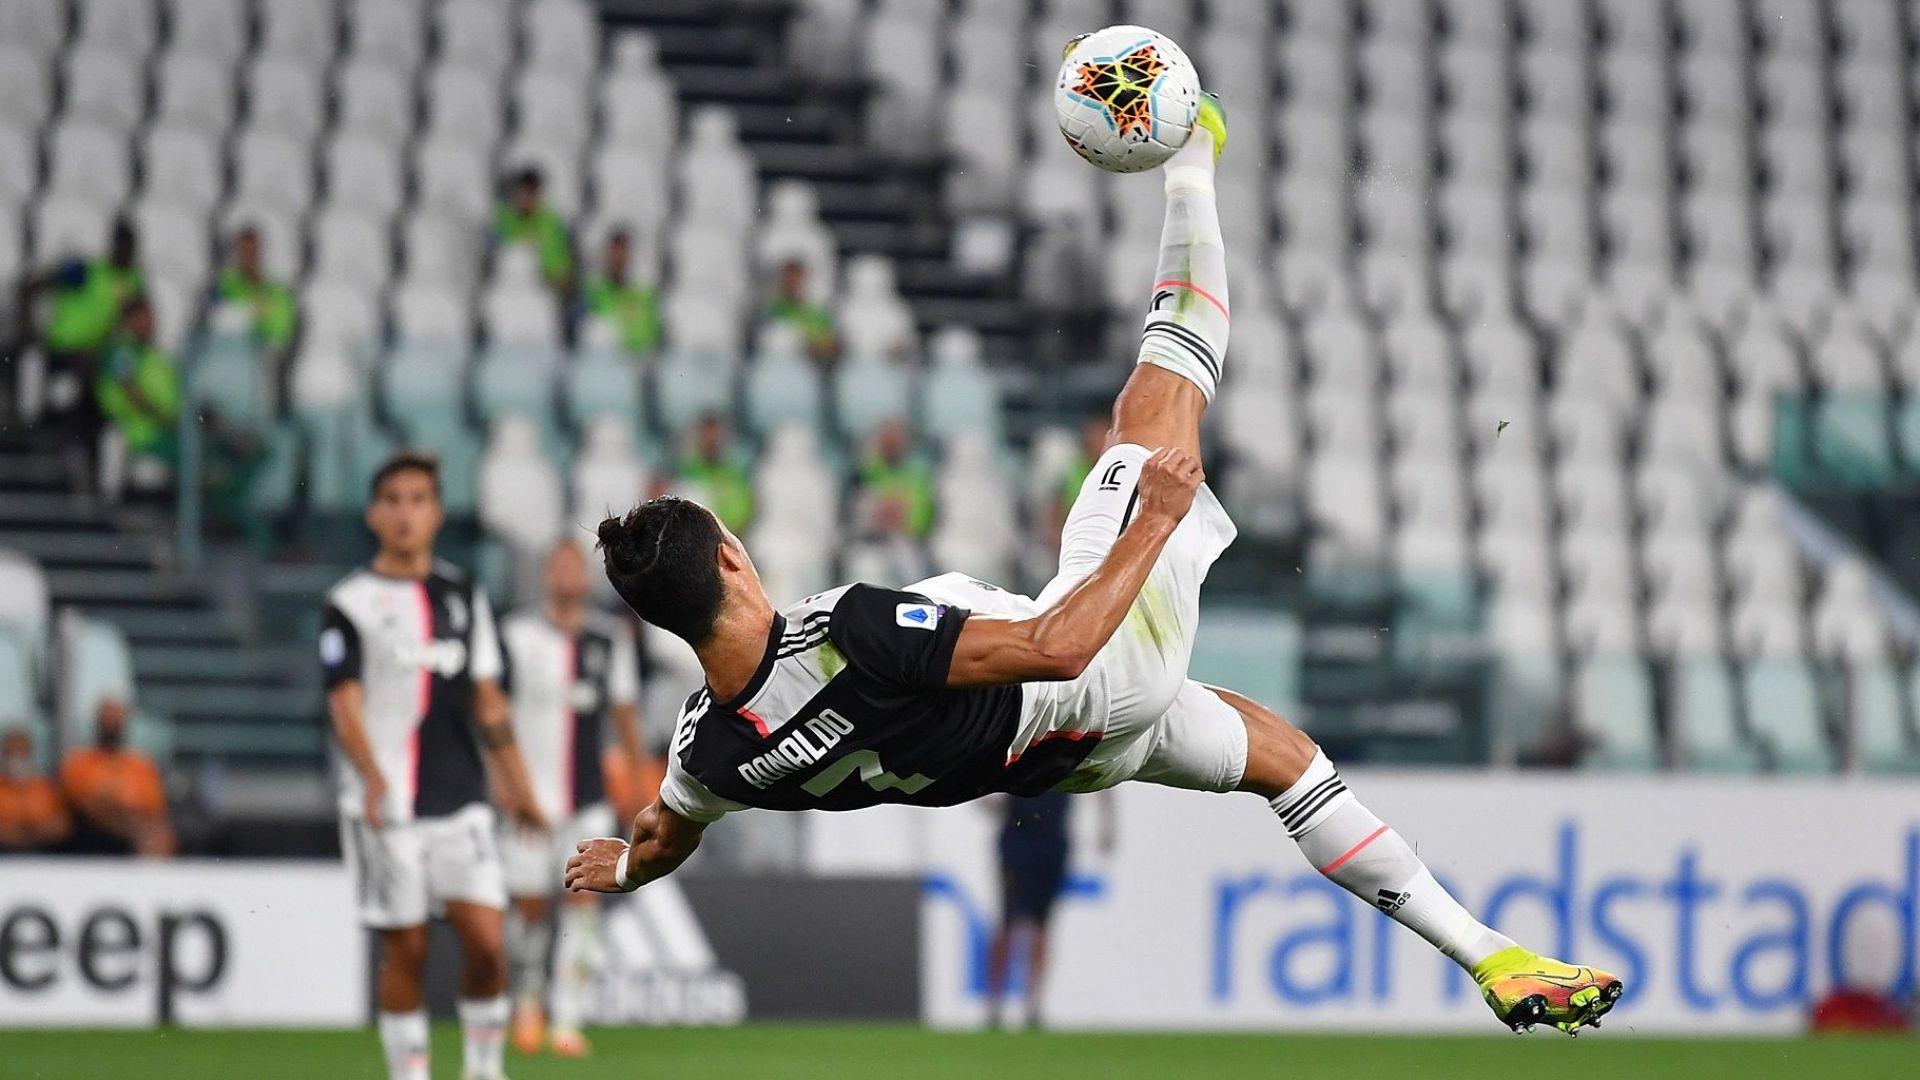 Роналдо и компания се развихриха с 4 гола за полувреме